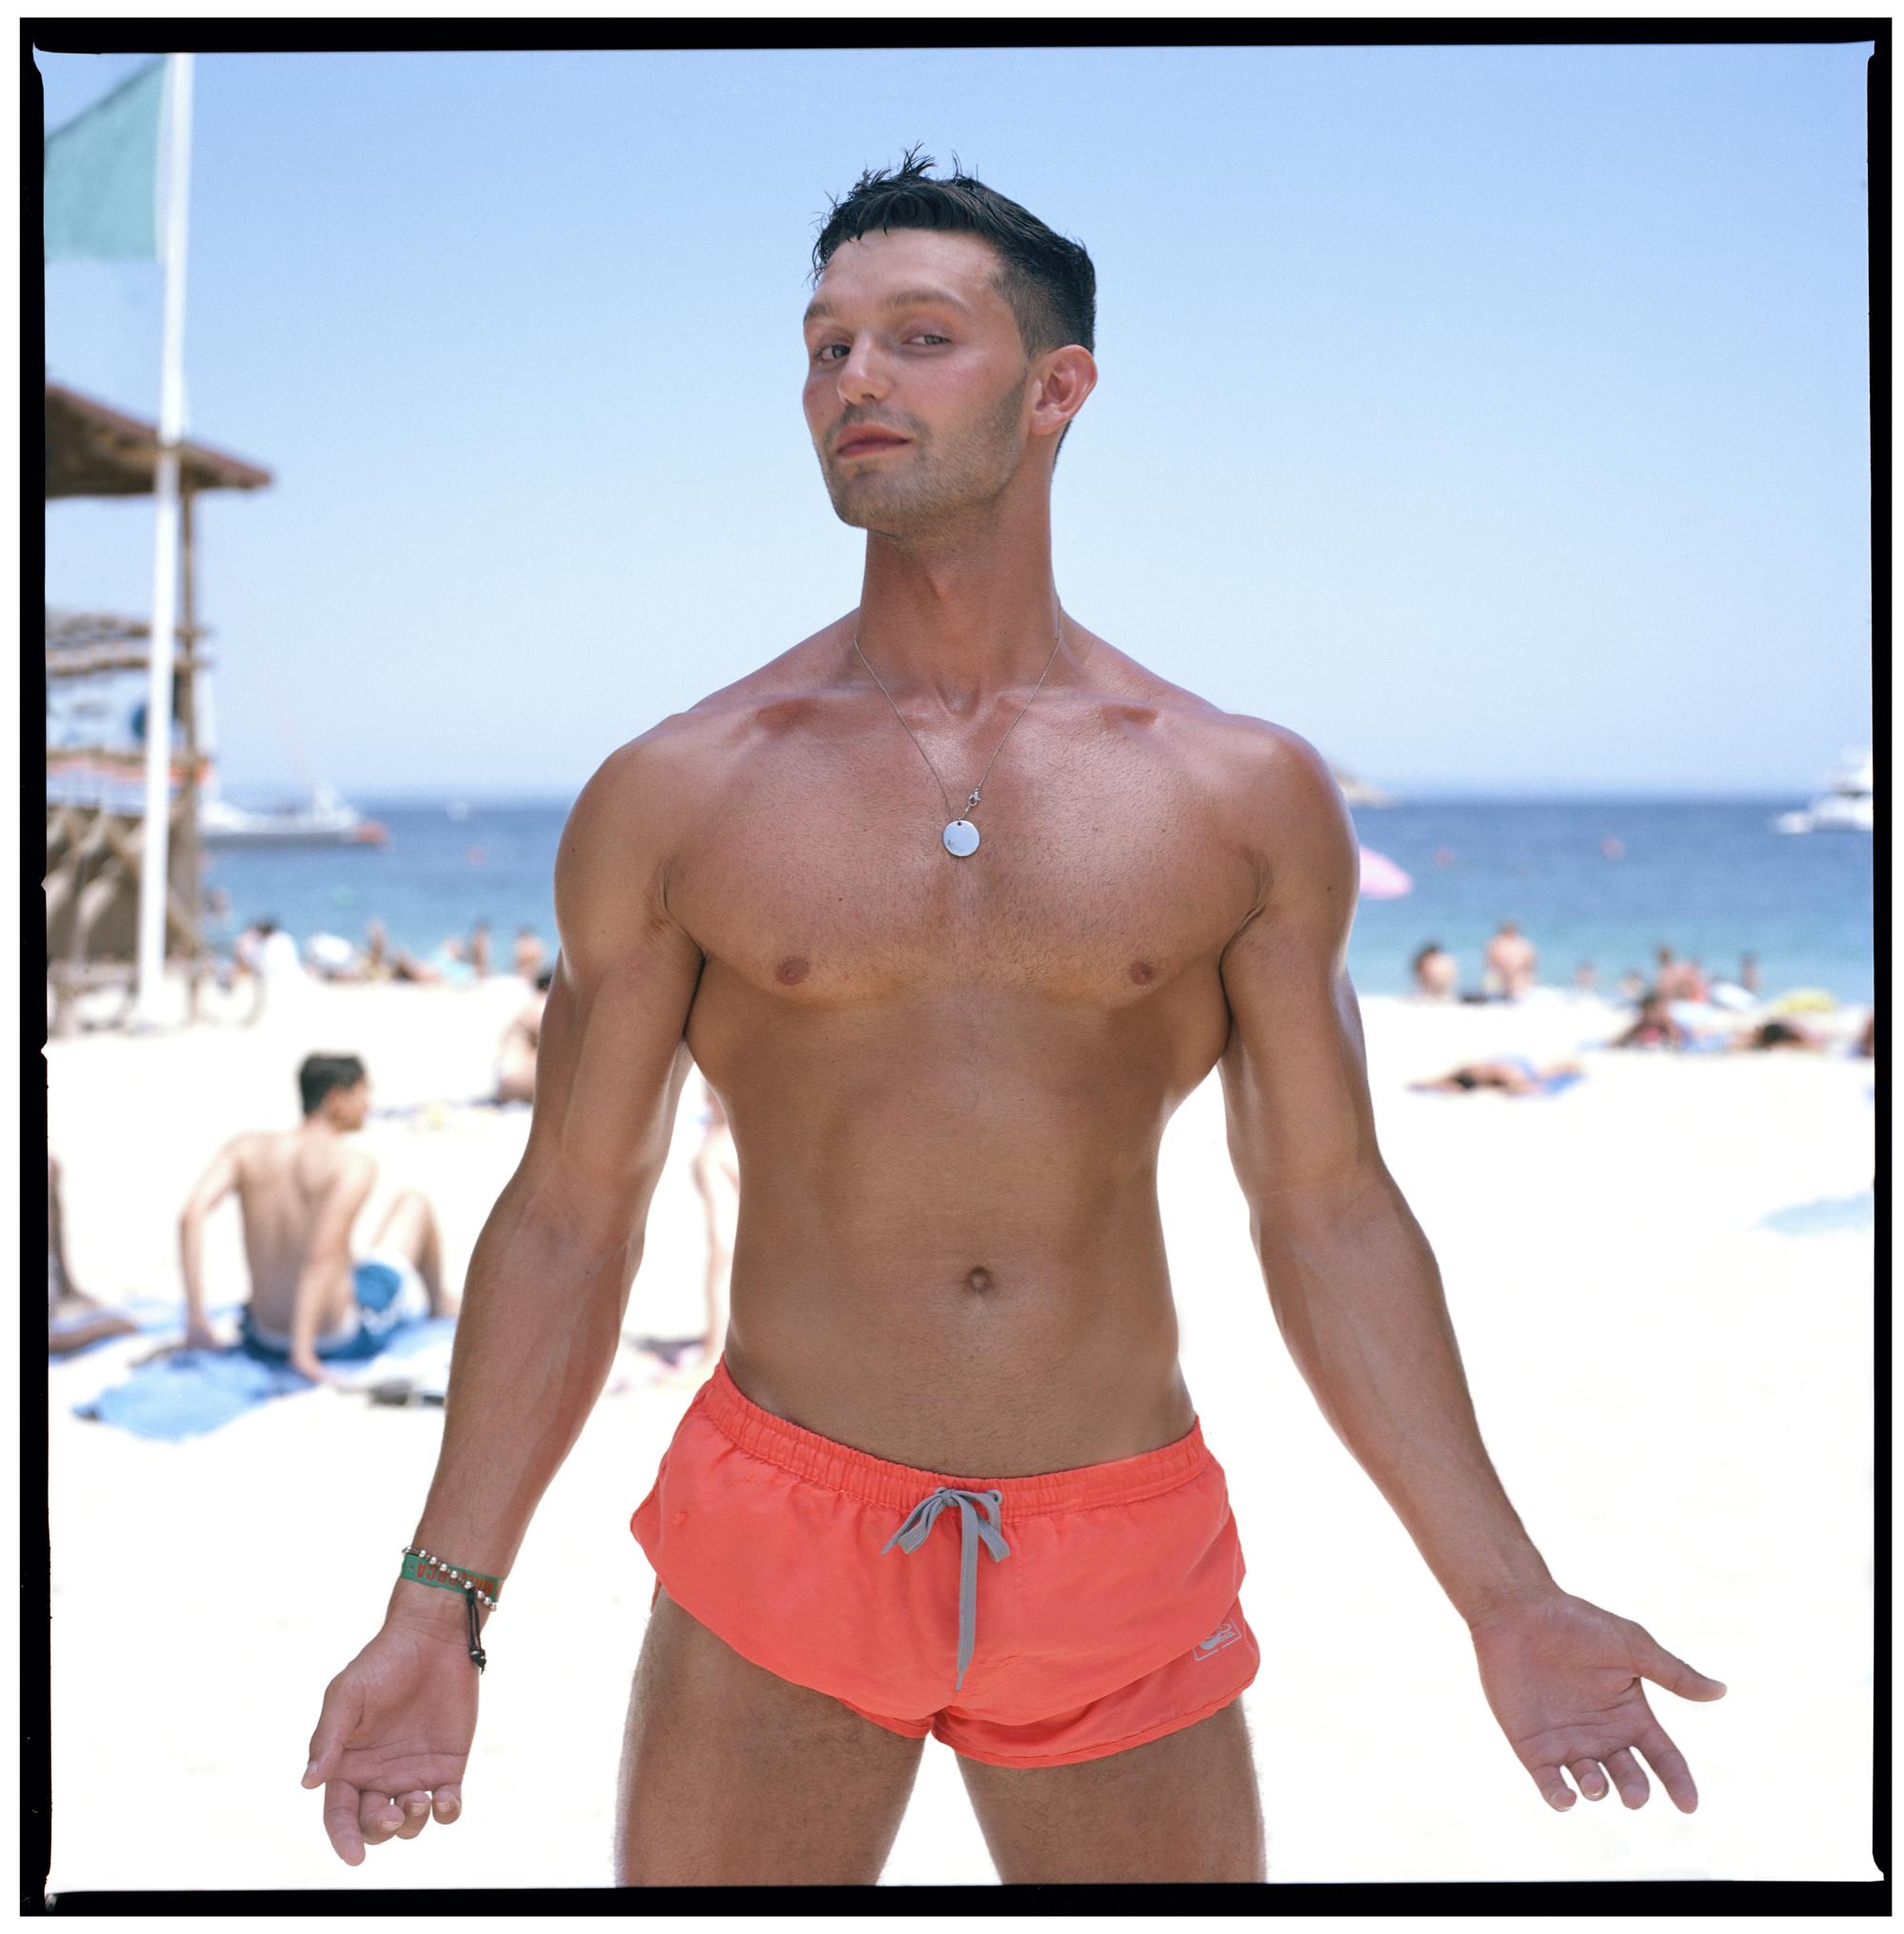 Grant Smith - Man body builder on beach